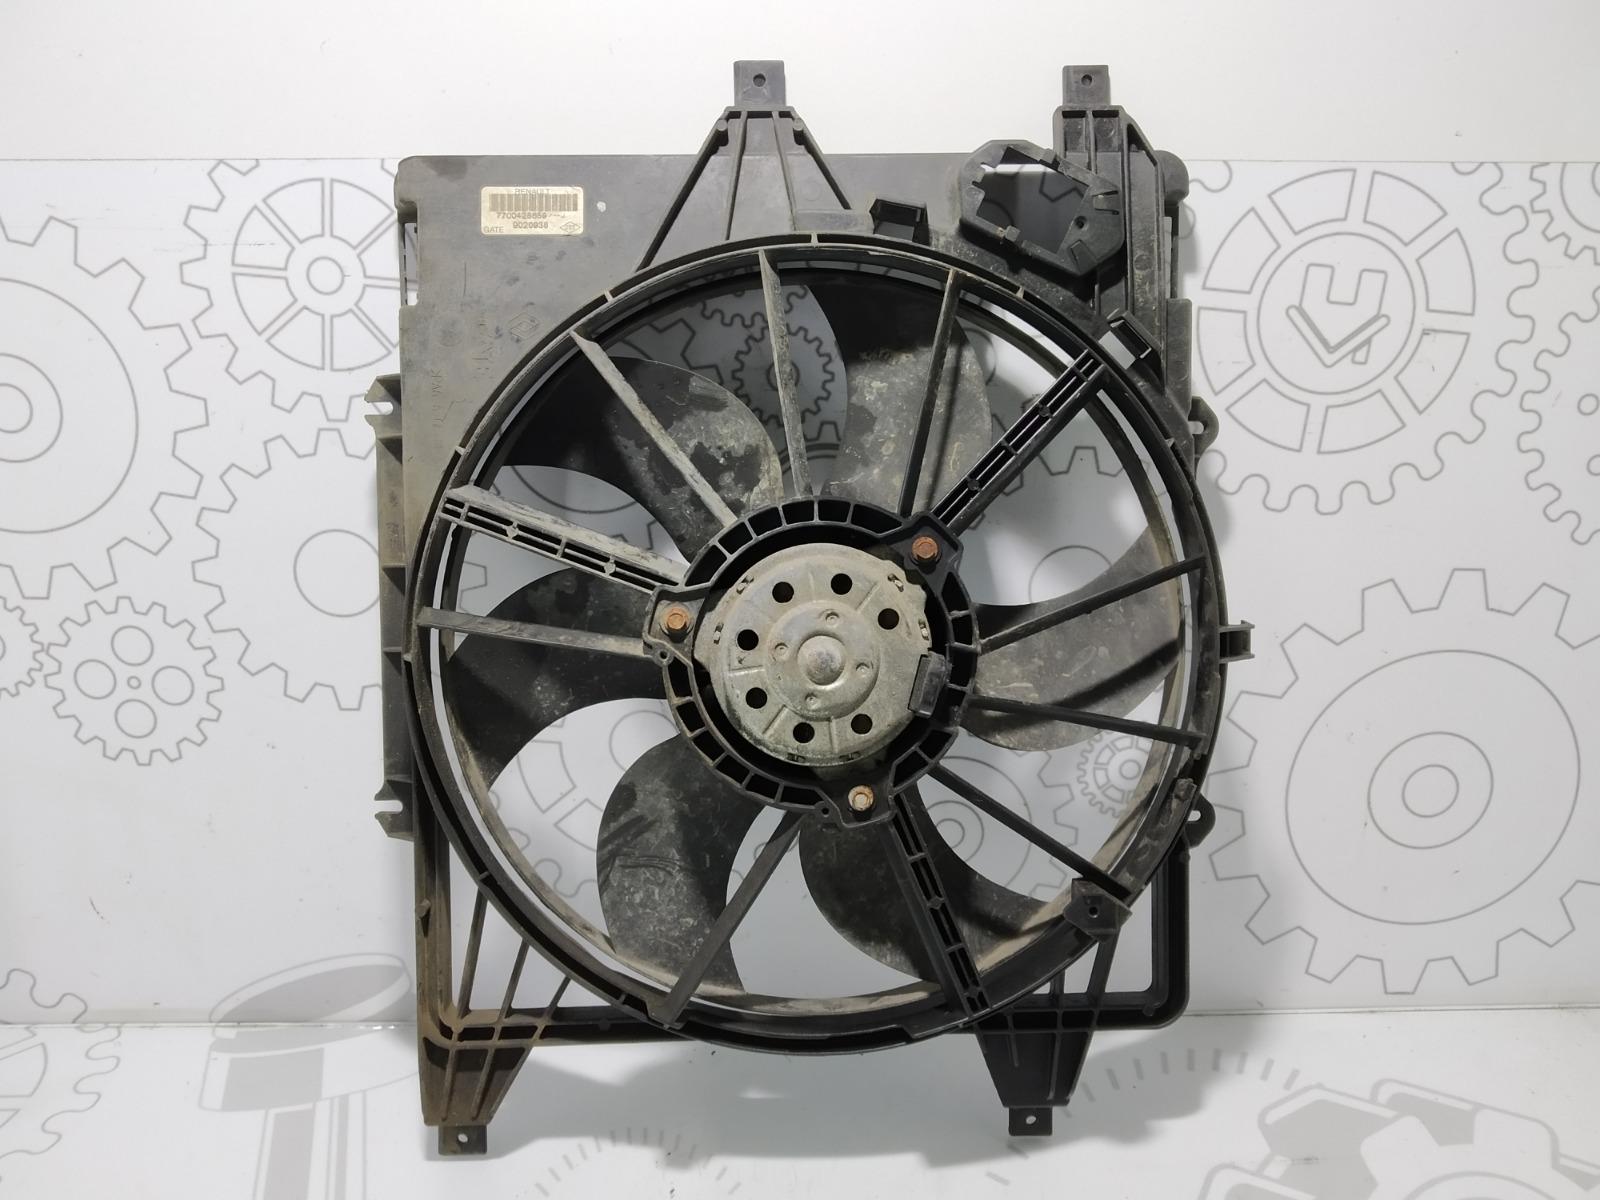 Вентилятор радиатора Renault Kangoo 1.2 I 2007 (б/у)